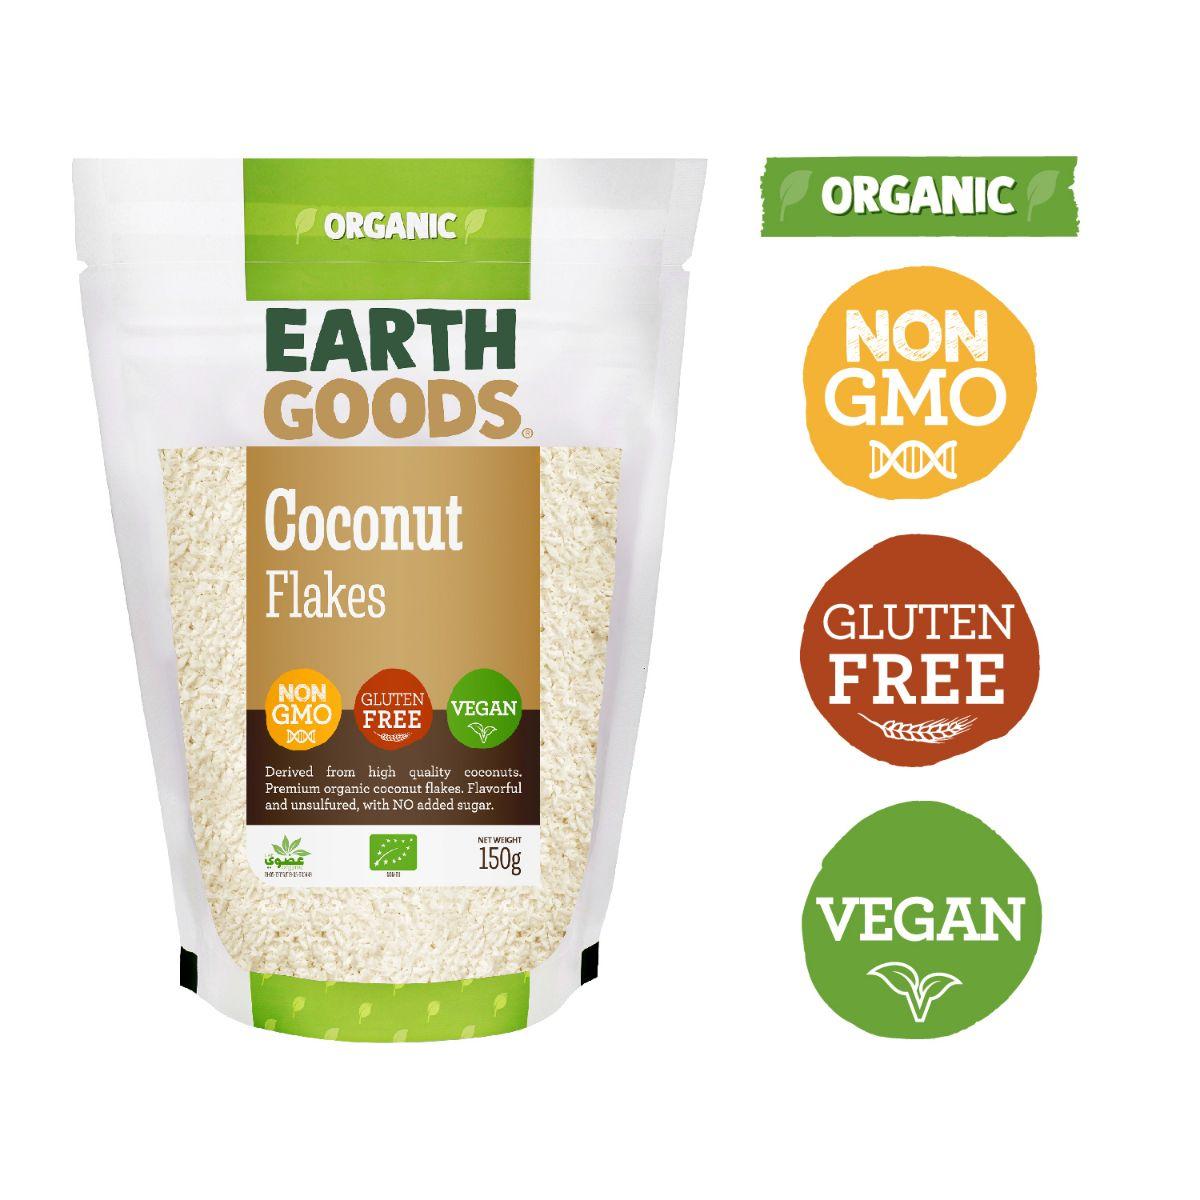 Earth Goods Organic Coconut Flakes - 150g